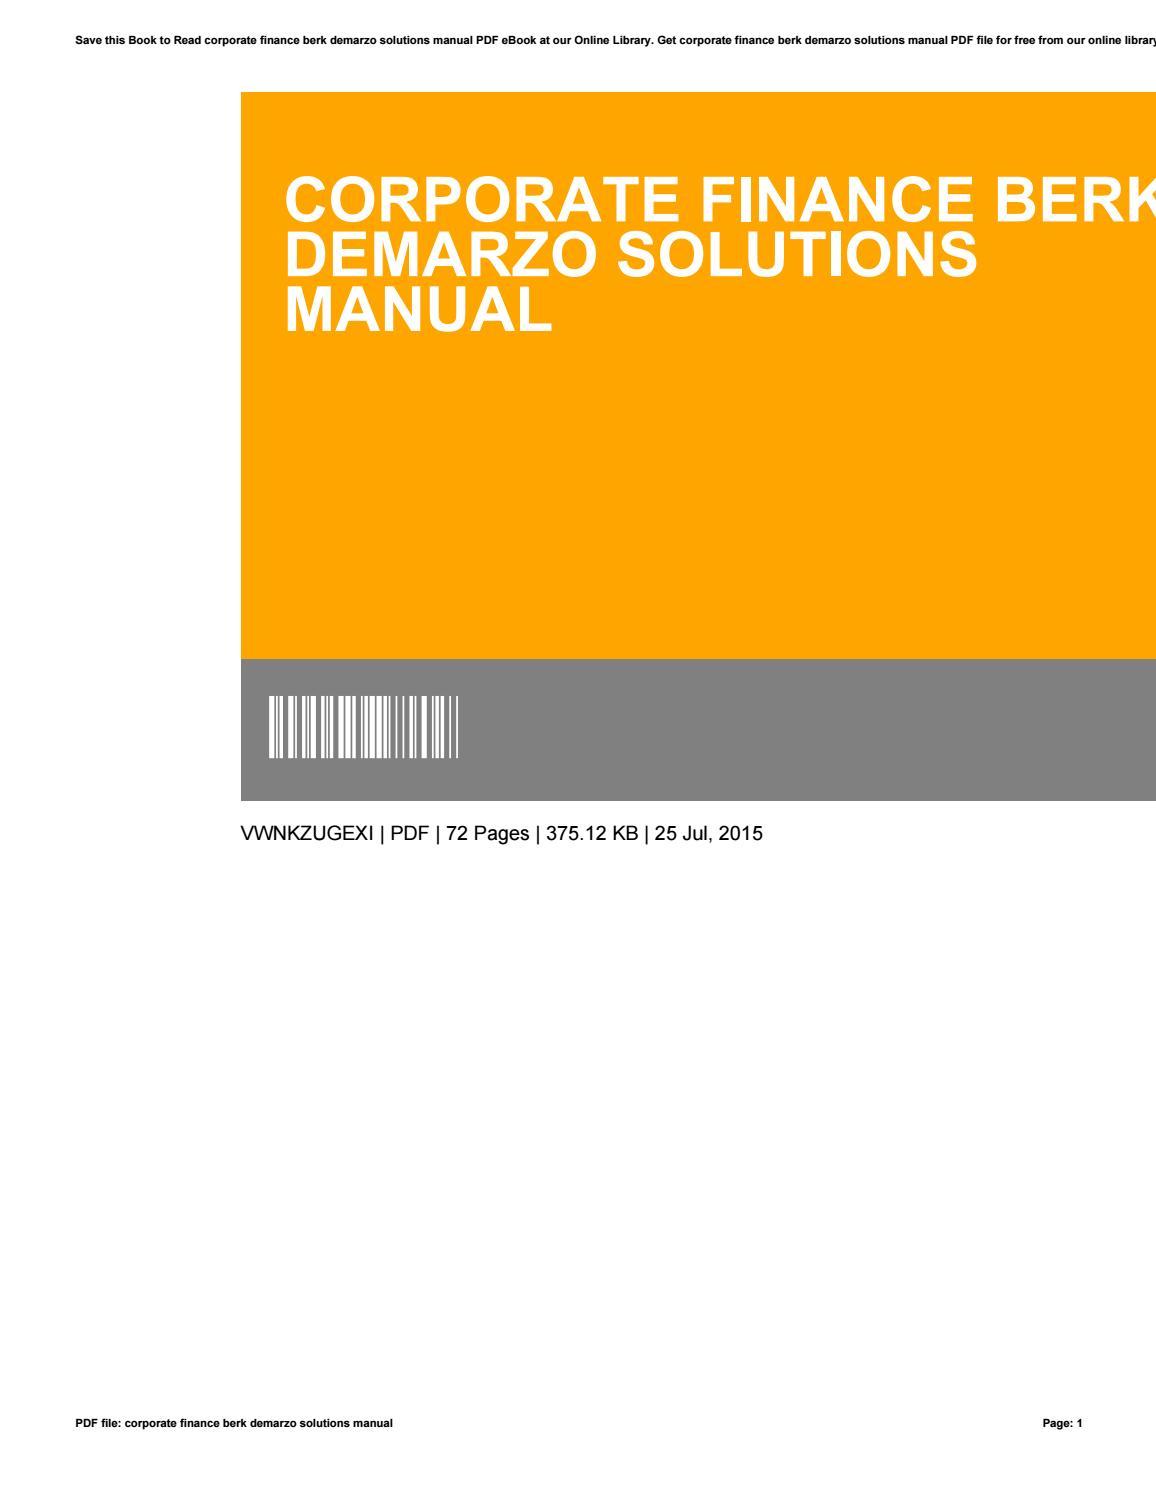 Corporate finance berk demarzo solutions manual by MatthewEldridge4397 -  issuu